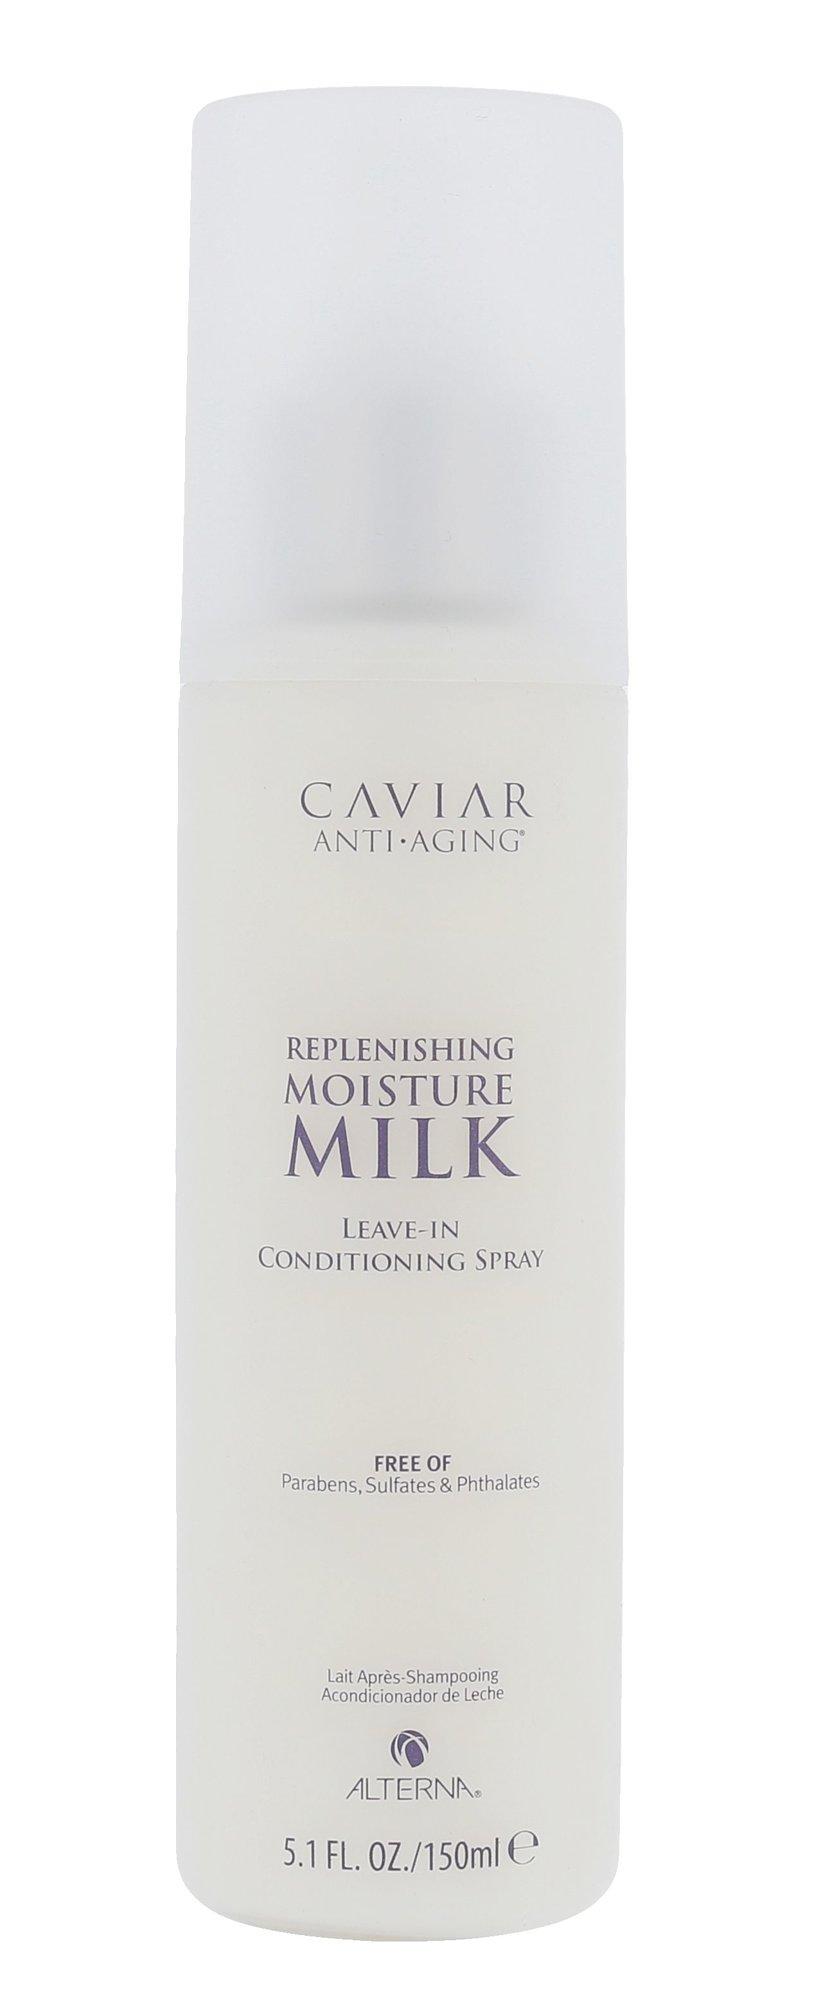 Alterna Caviar Anti-Aging Cosmetic 150ml